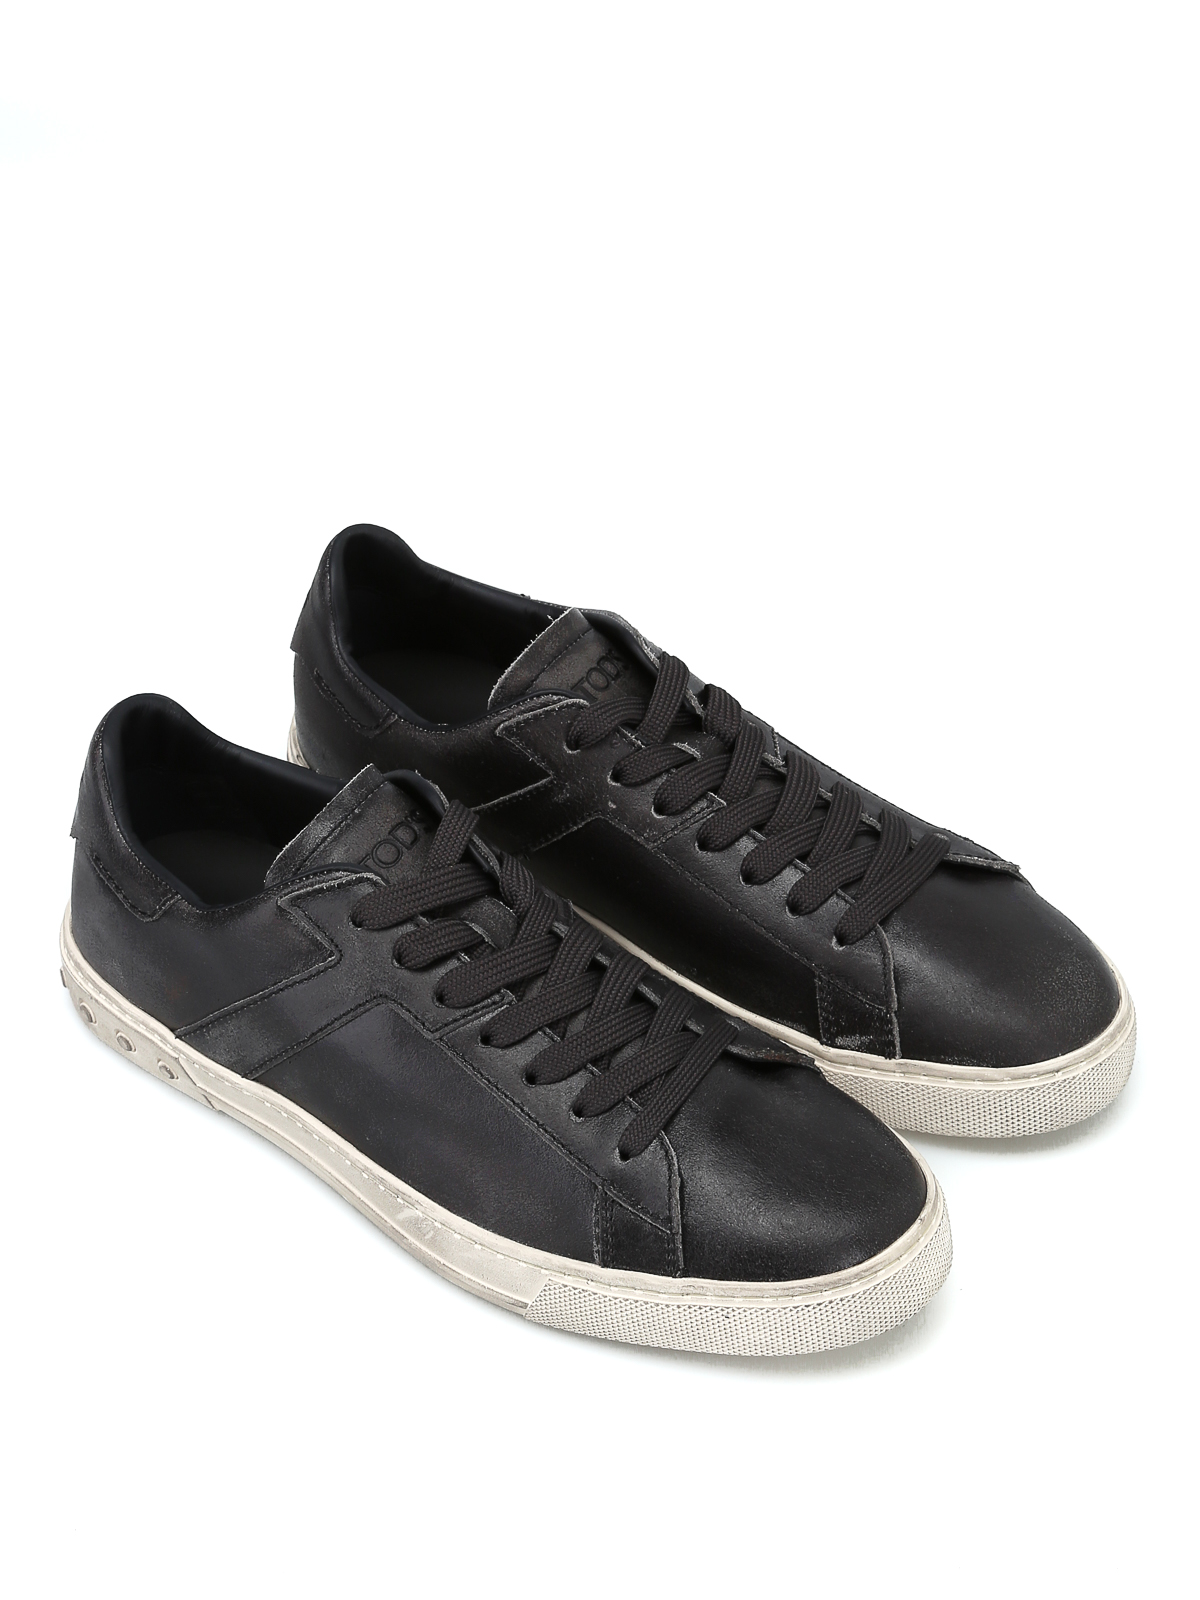 Tod's Vintage In Sneakers Pelle Basse Usato Effetto Sneaker SUGpqLVzM